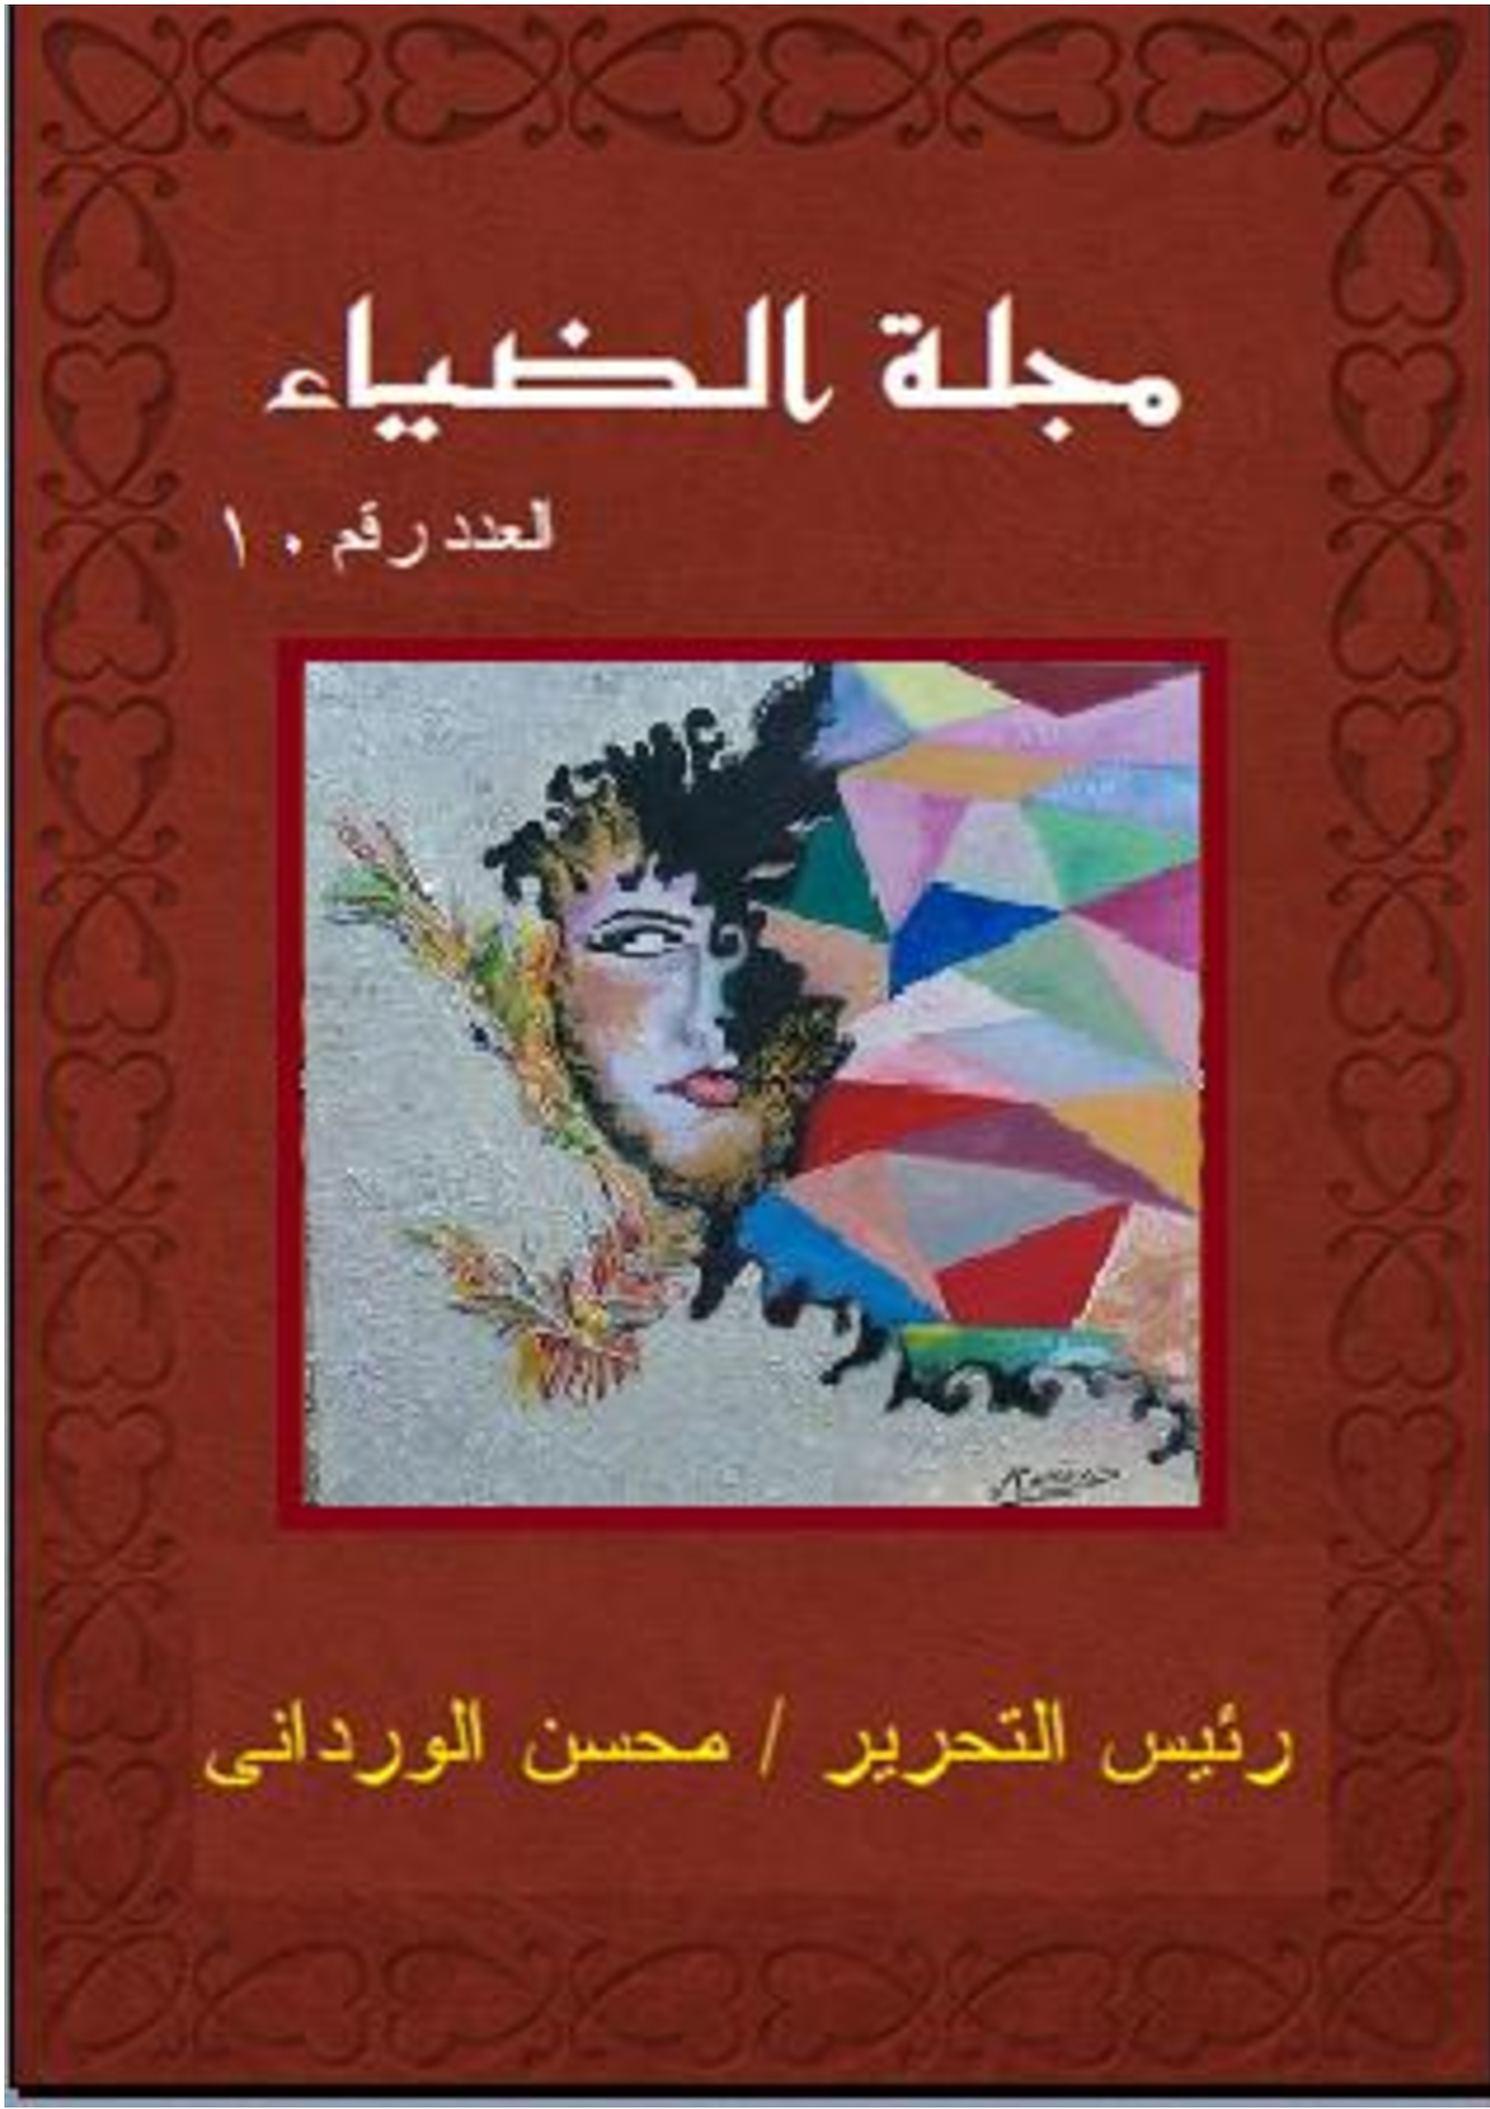 20aa685c67e9b Calaméo - مجلة الضياء العدد العاشر - رئيس التحرير محسن الوردانى